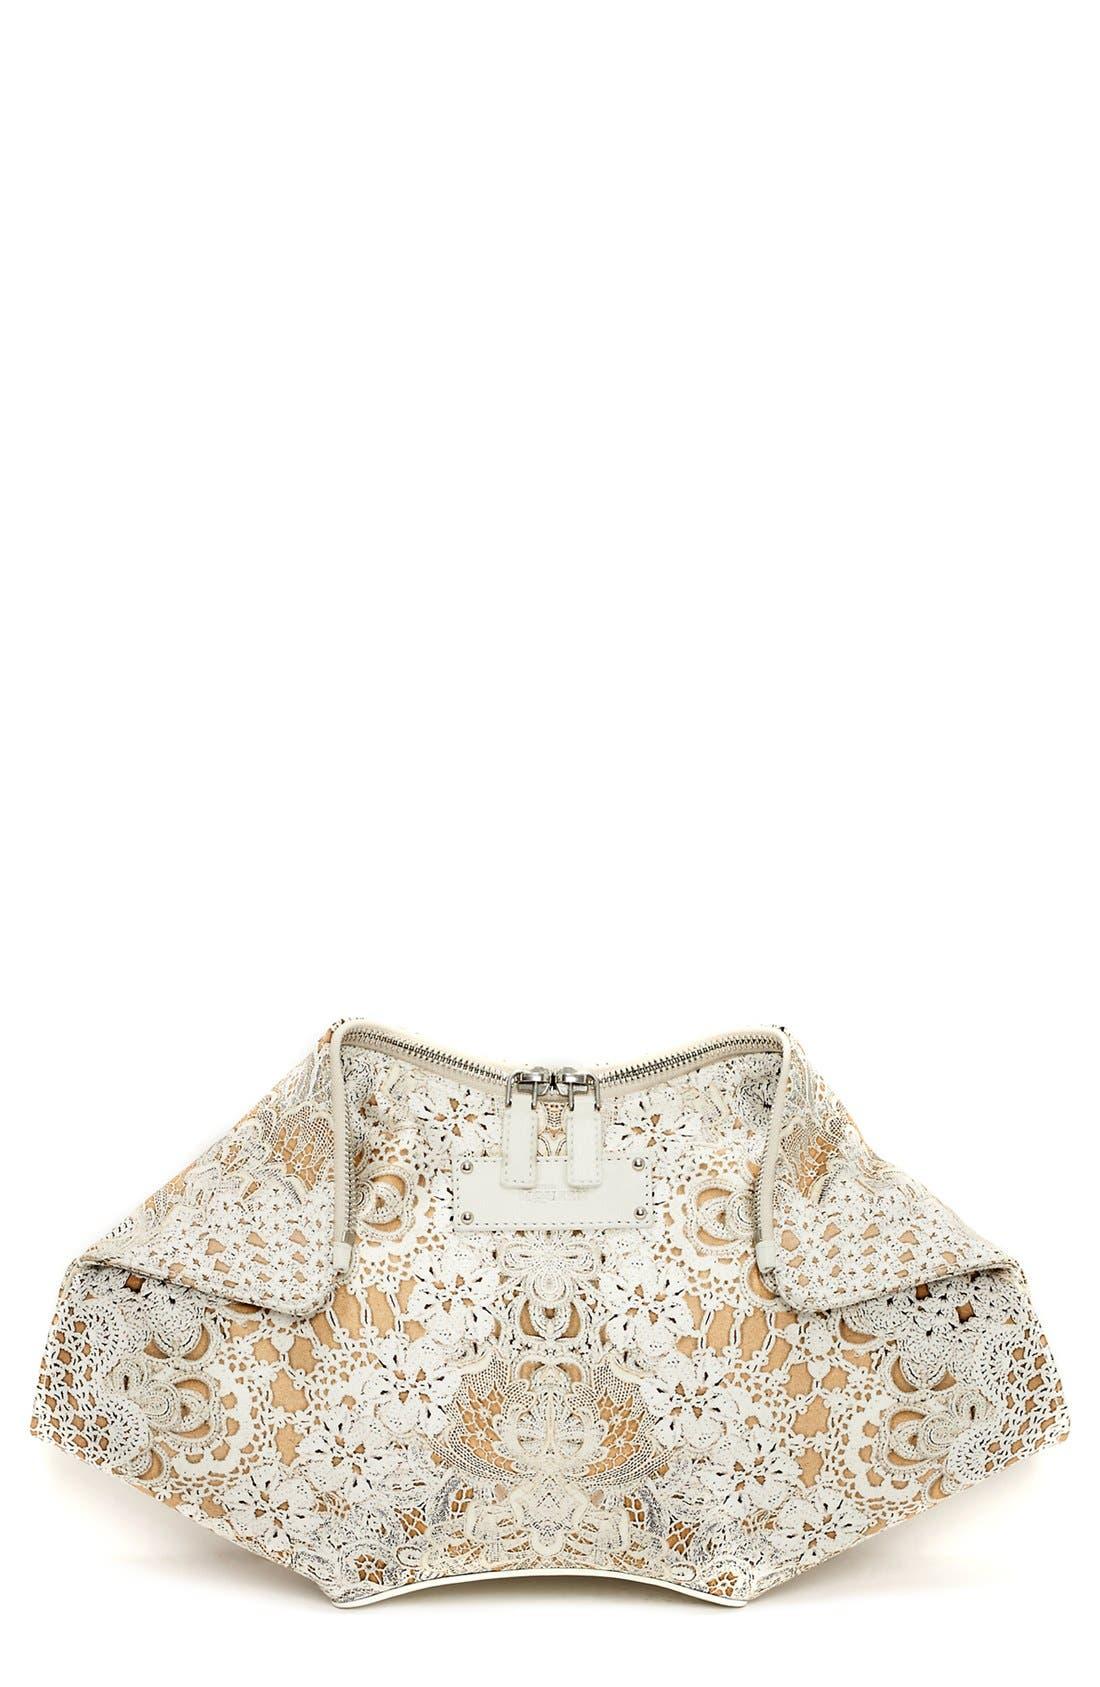 Main Image - Alexander McQueen 'De Manta' Silk & Leather Clutch